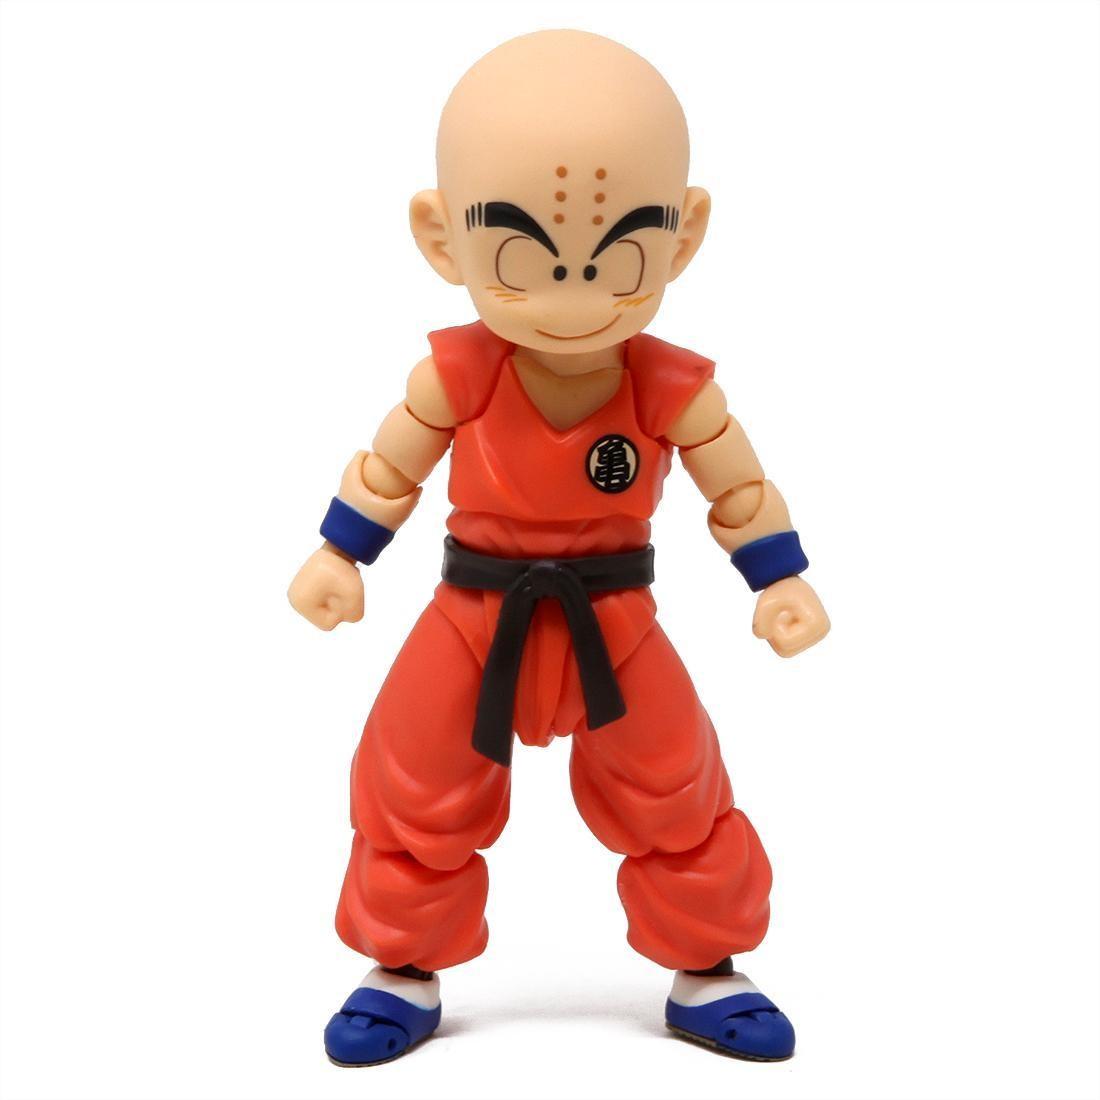 Bandai S.H.Figuarts Dragon Ball Krillin Childhood Figure (orange)